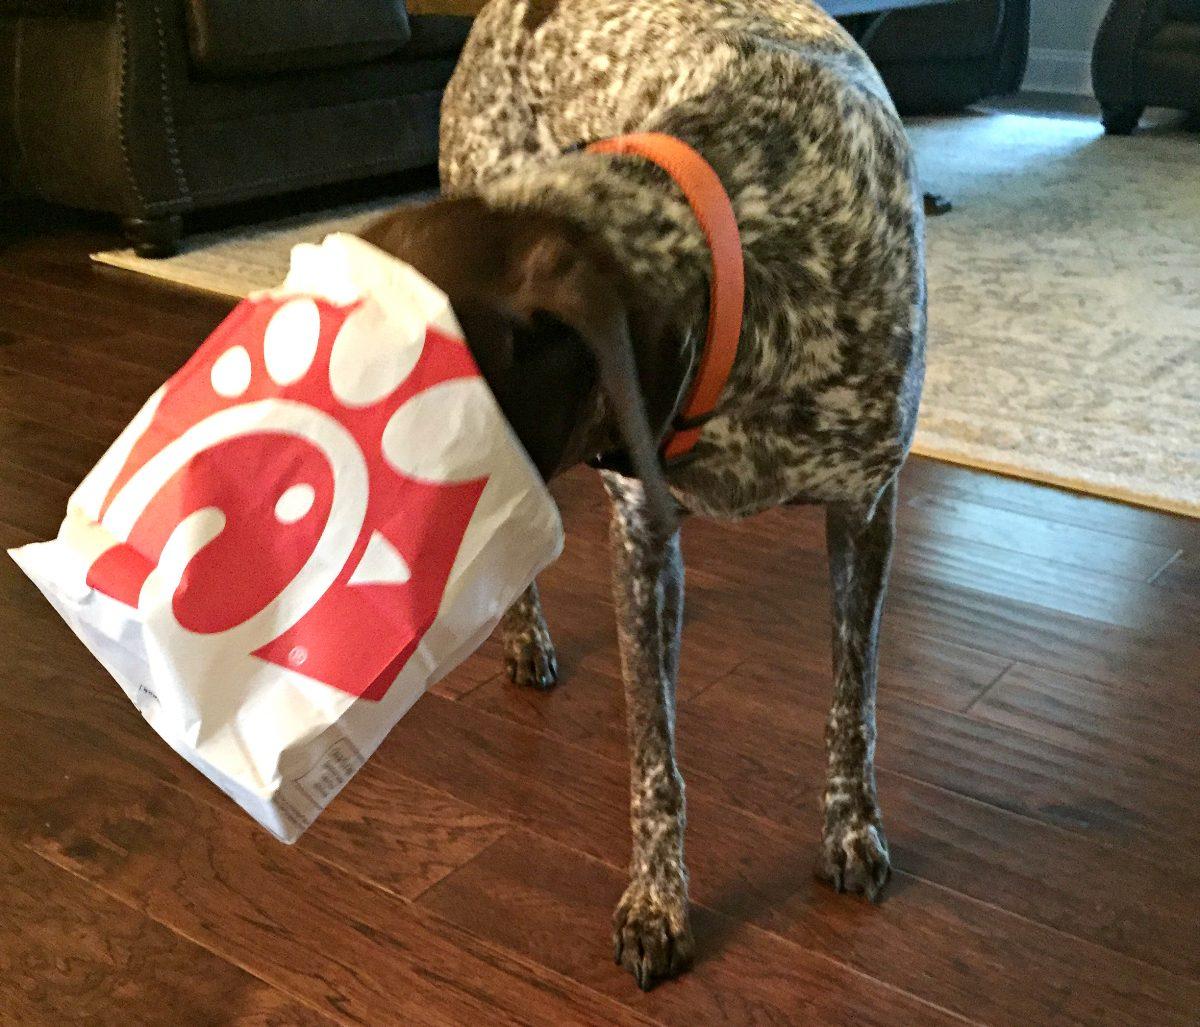 dog going through bag